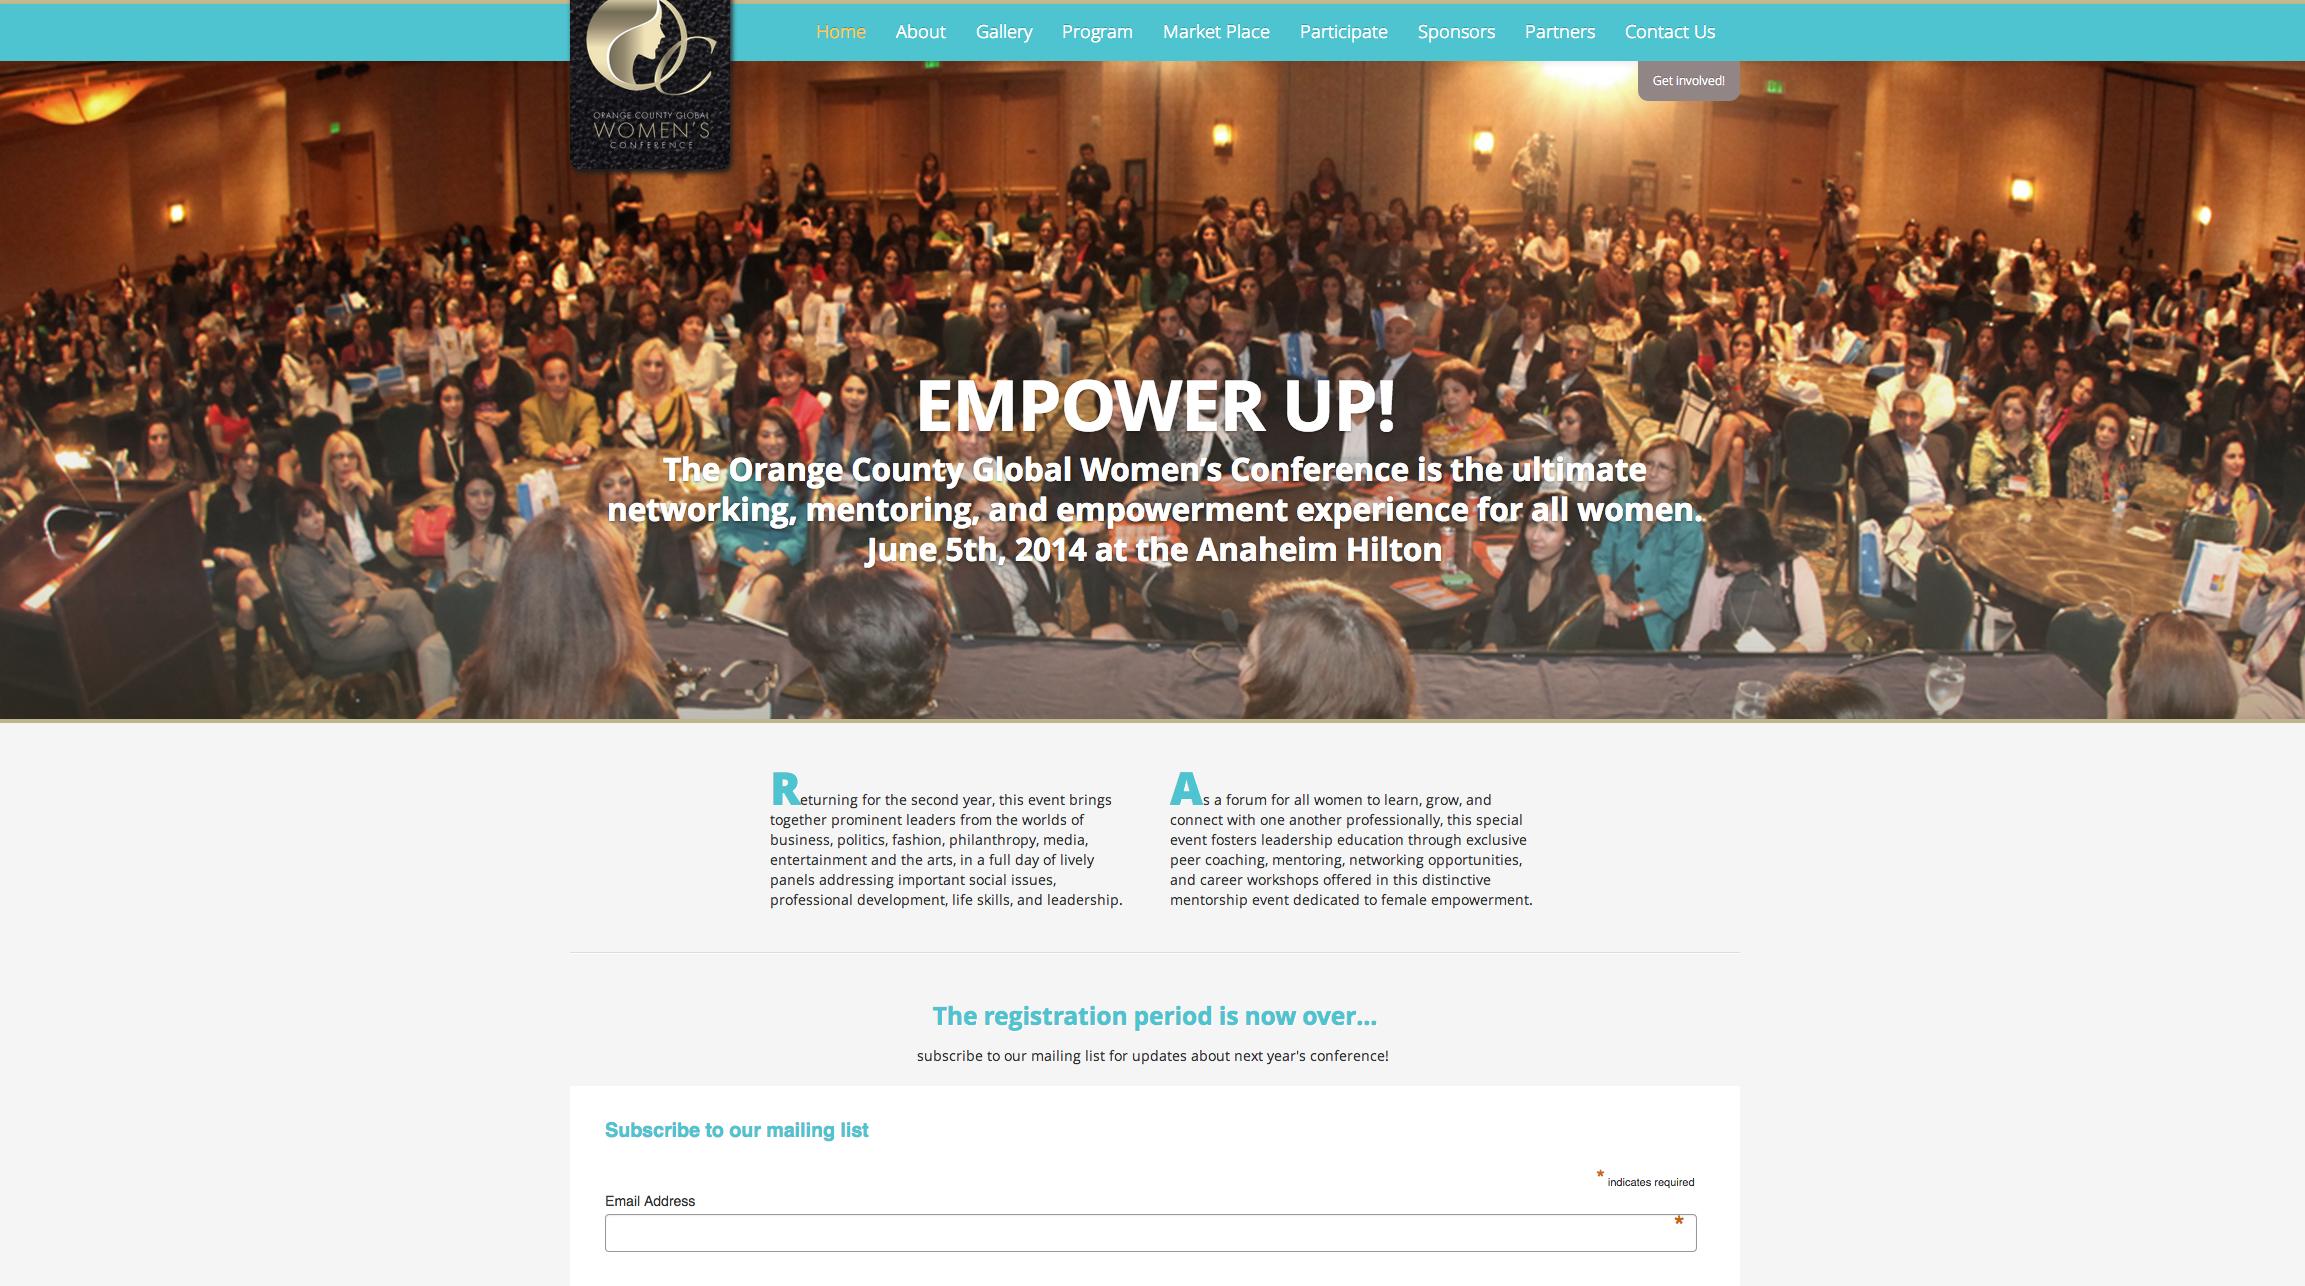 OC Global Women's Conference Web Design